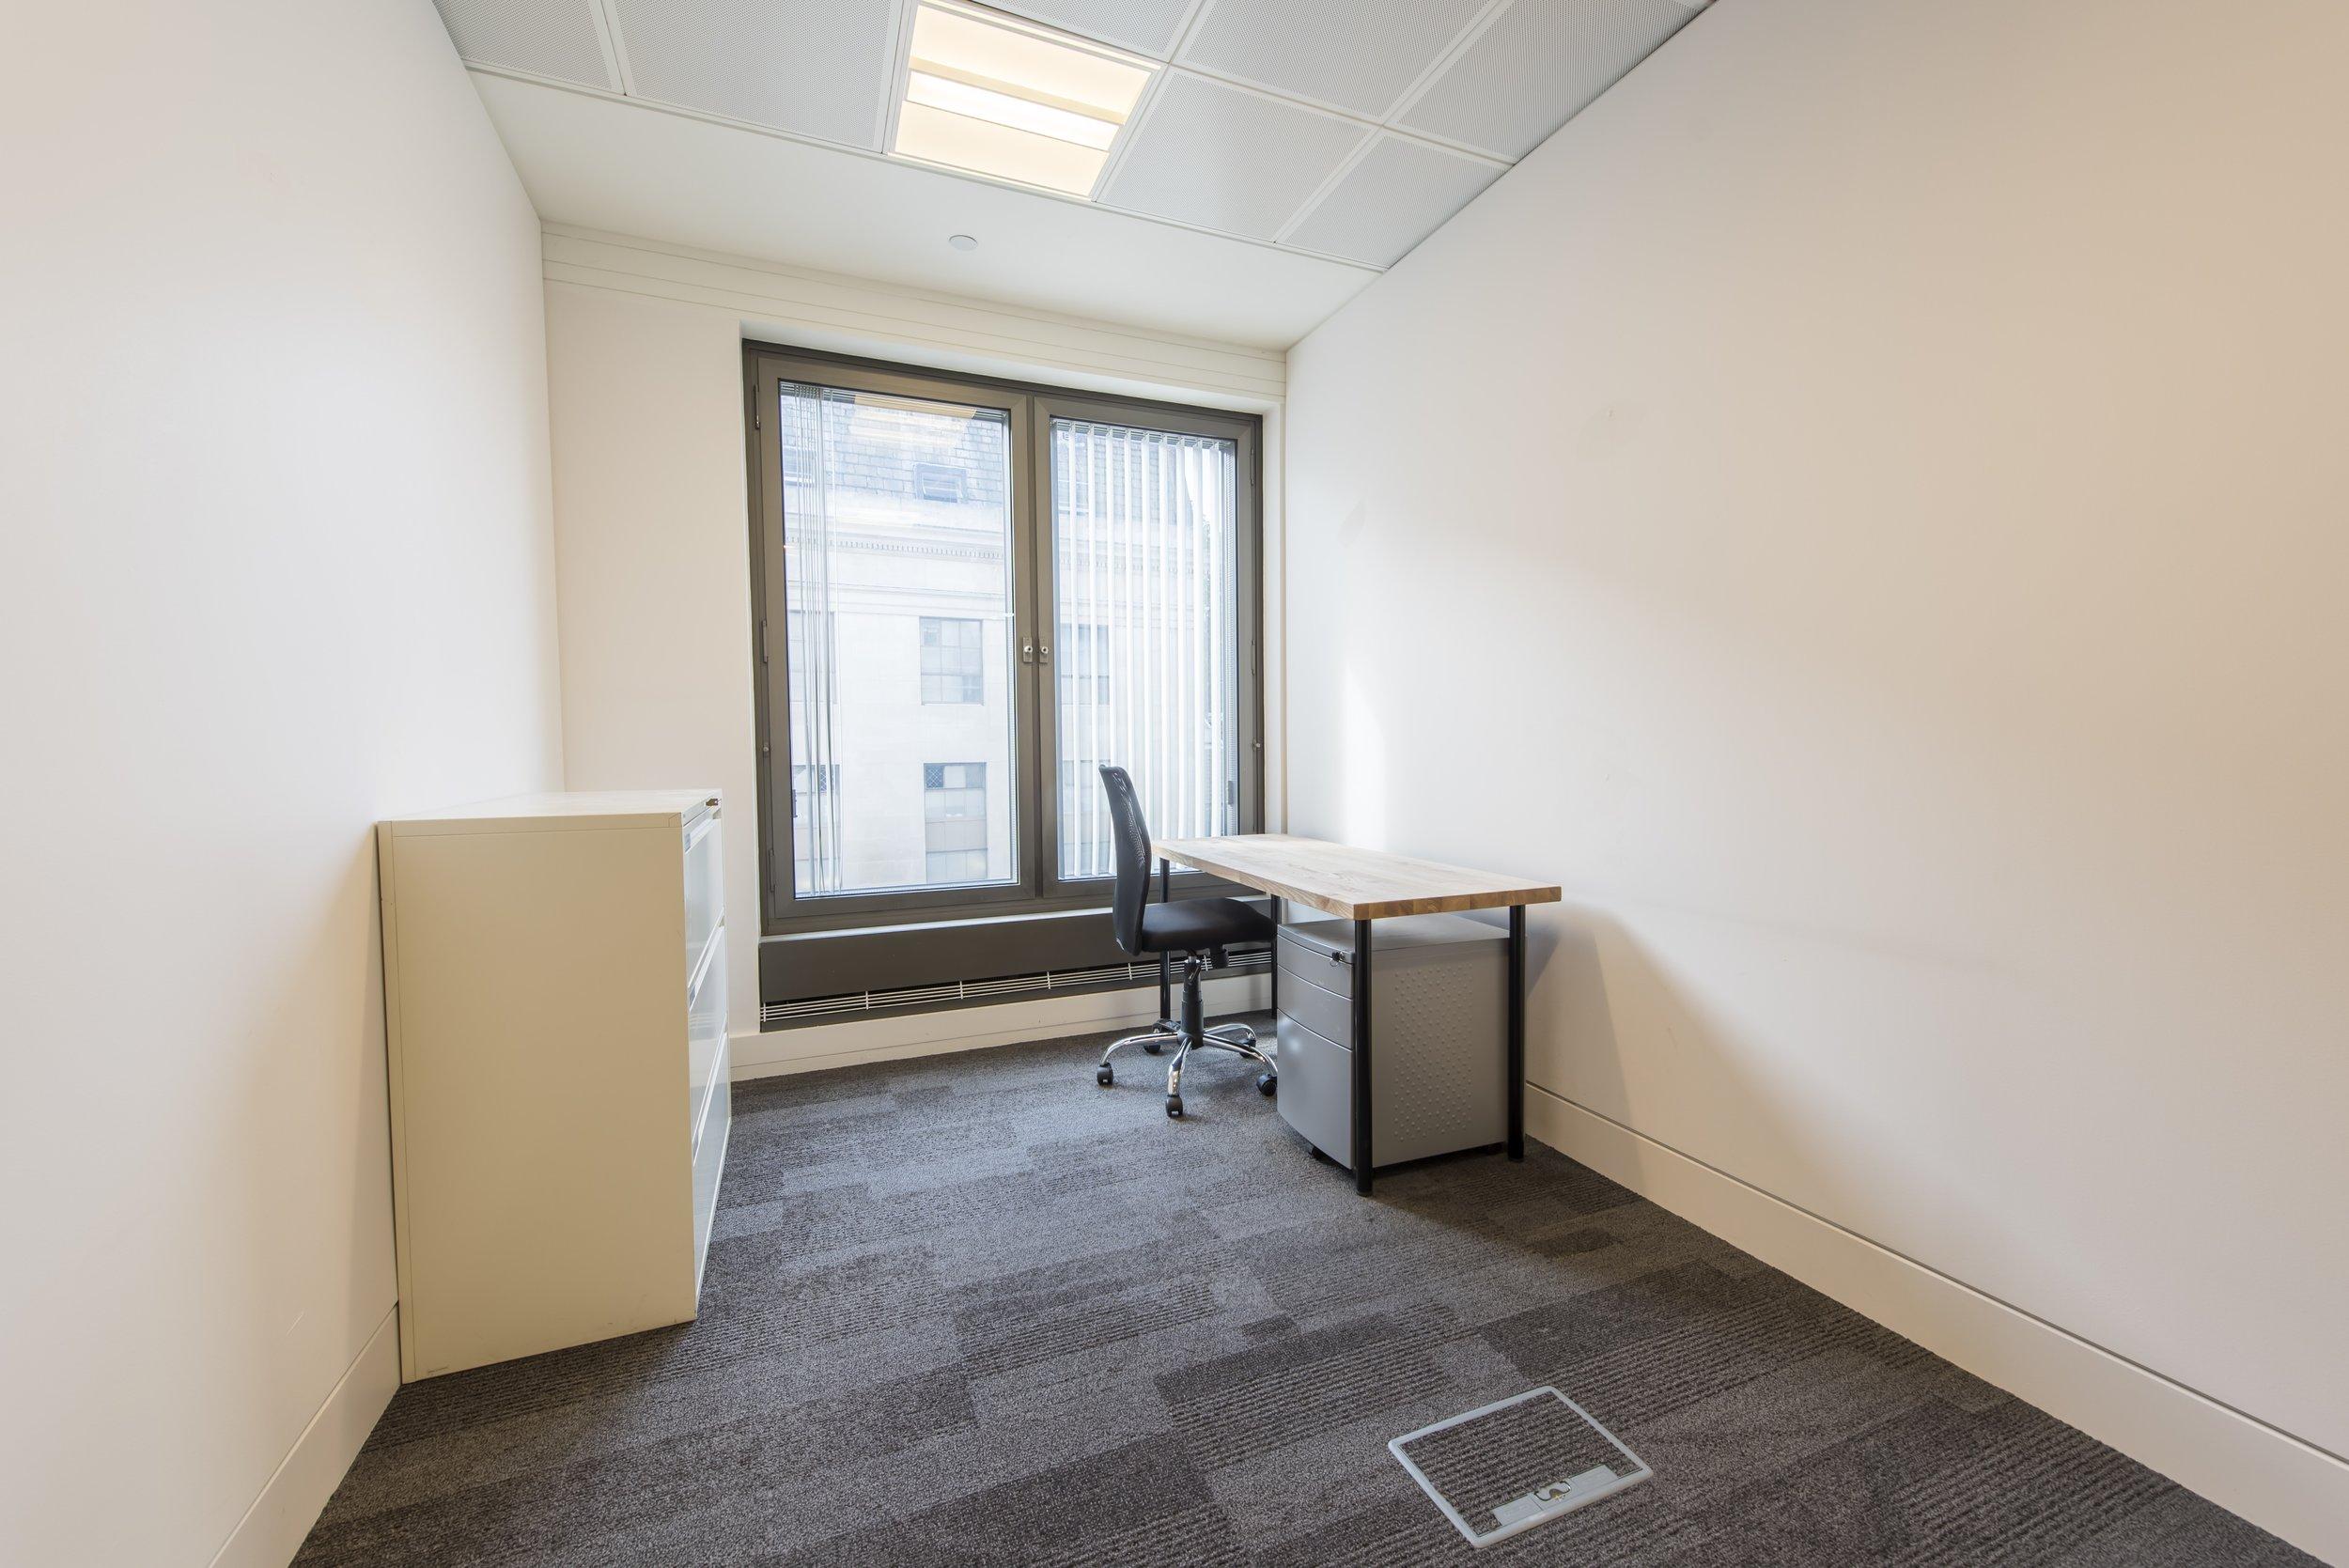 BG_H_BrunelEstates_LansdownHouse_OfficeExample1_171012_001.jpg